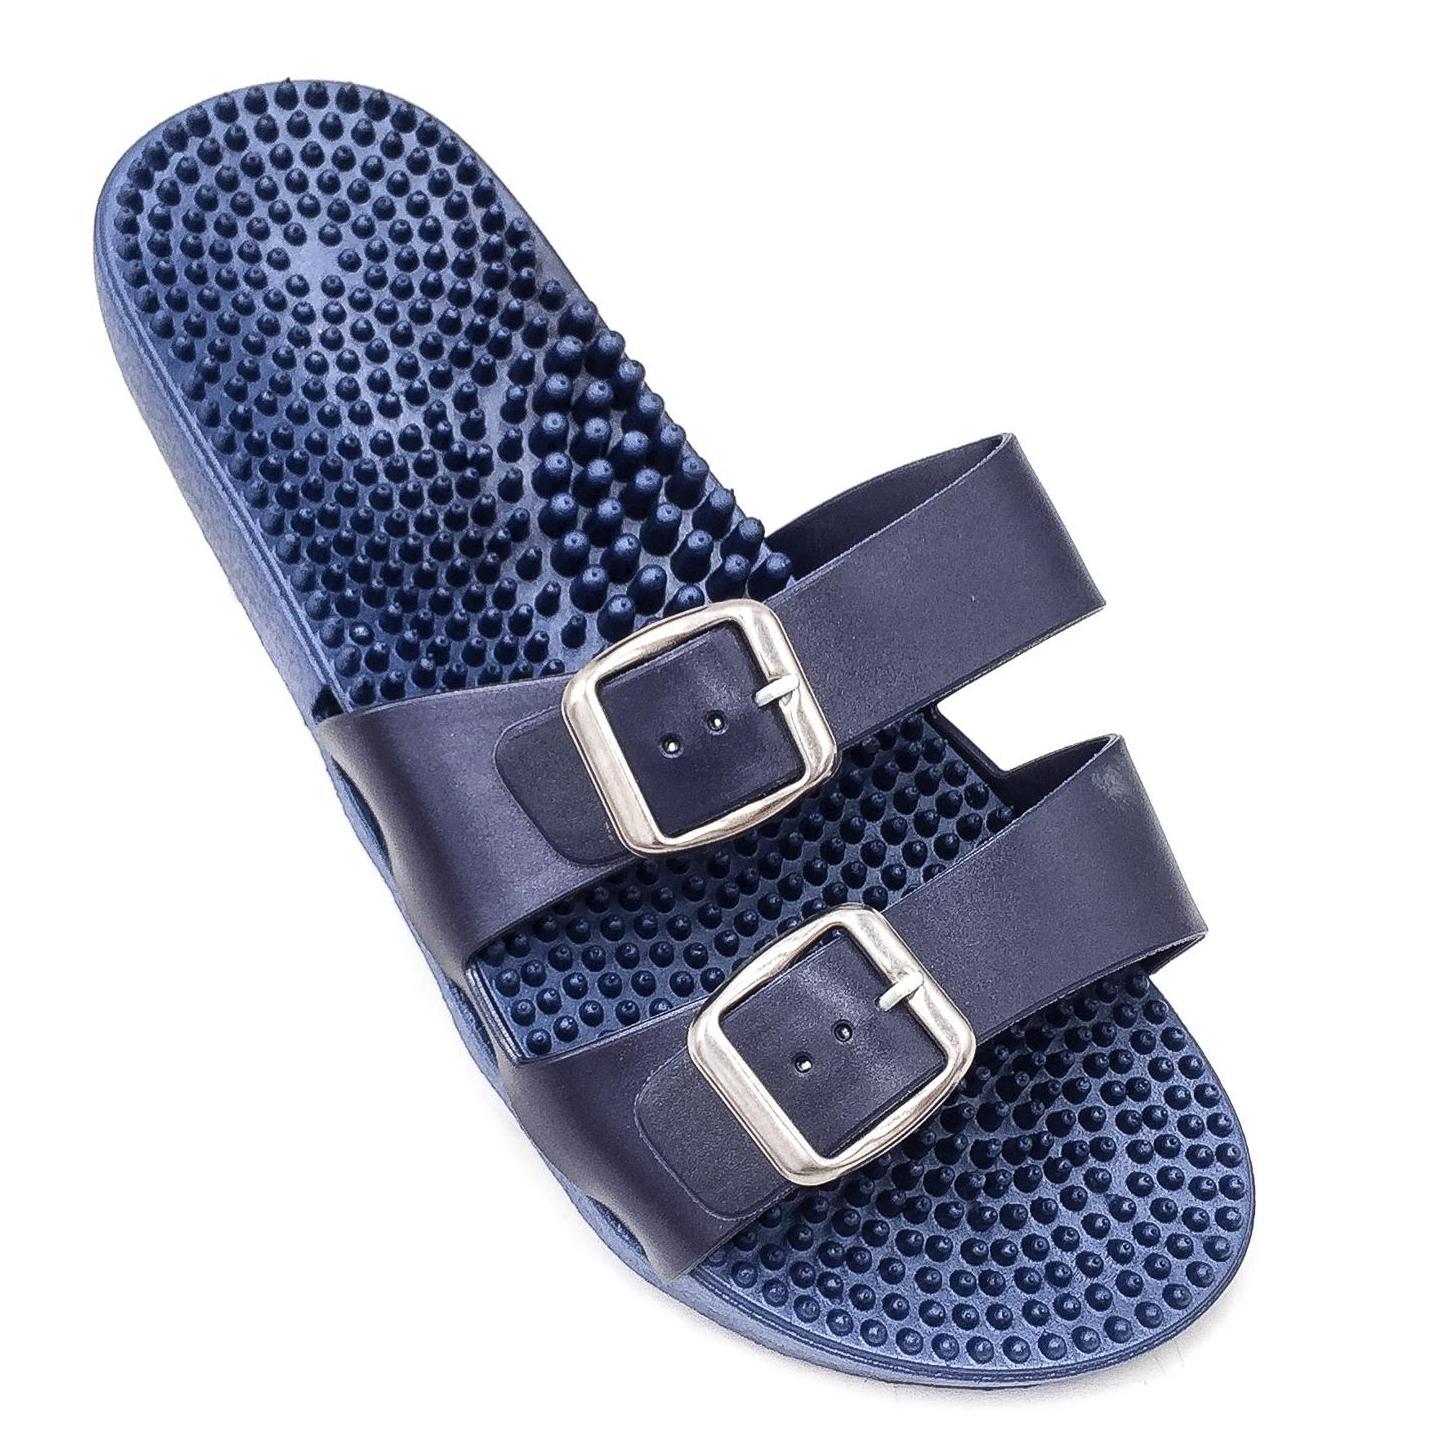 f4c3c14ff89 Flip Flops for Women for sale - Womens Flip Flops online brands ...